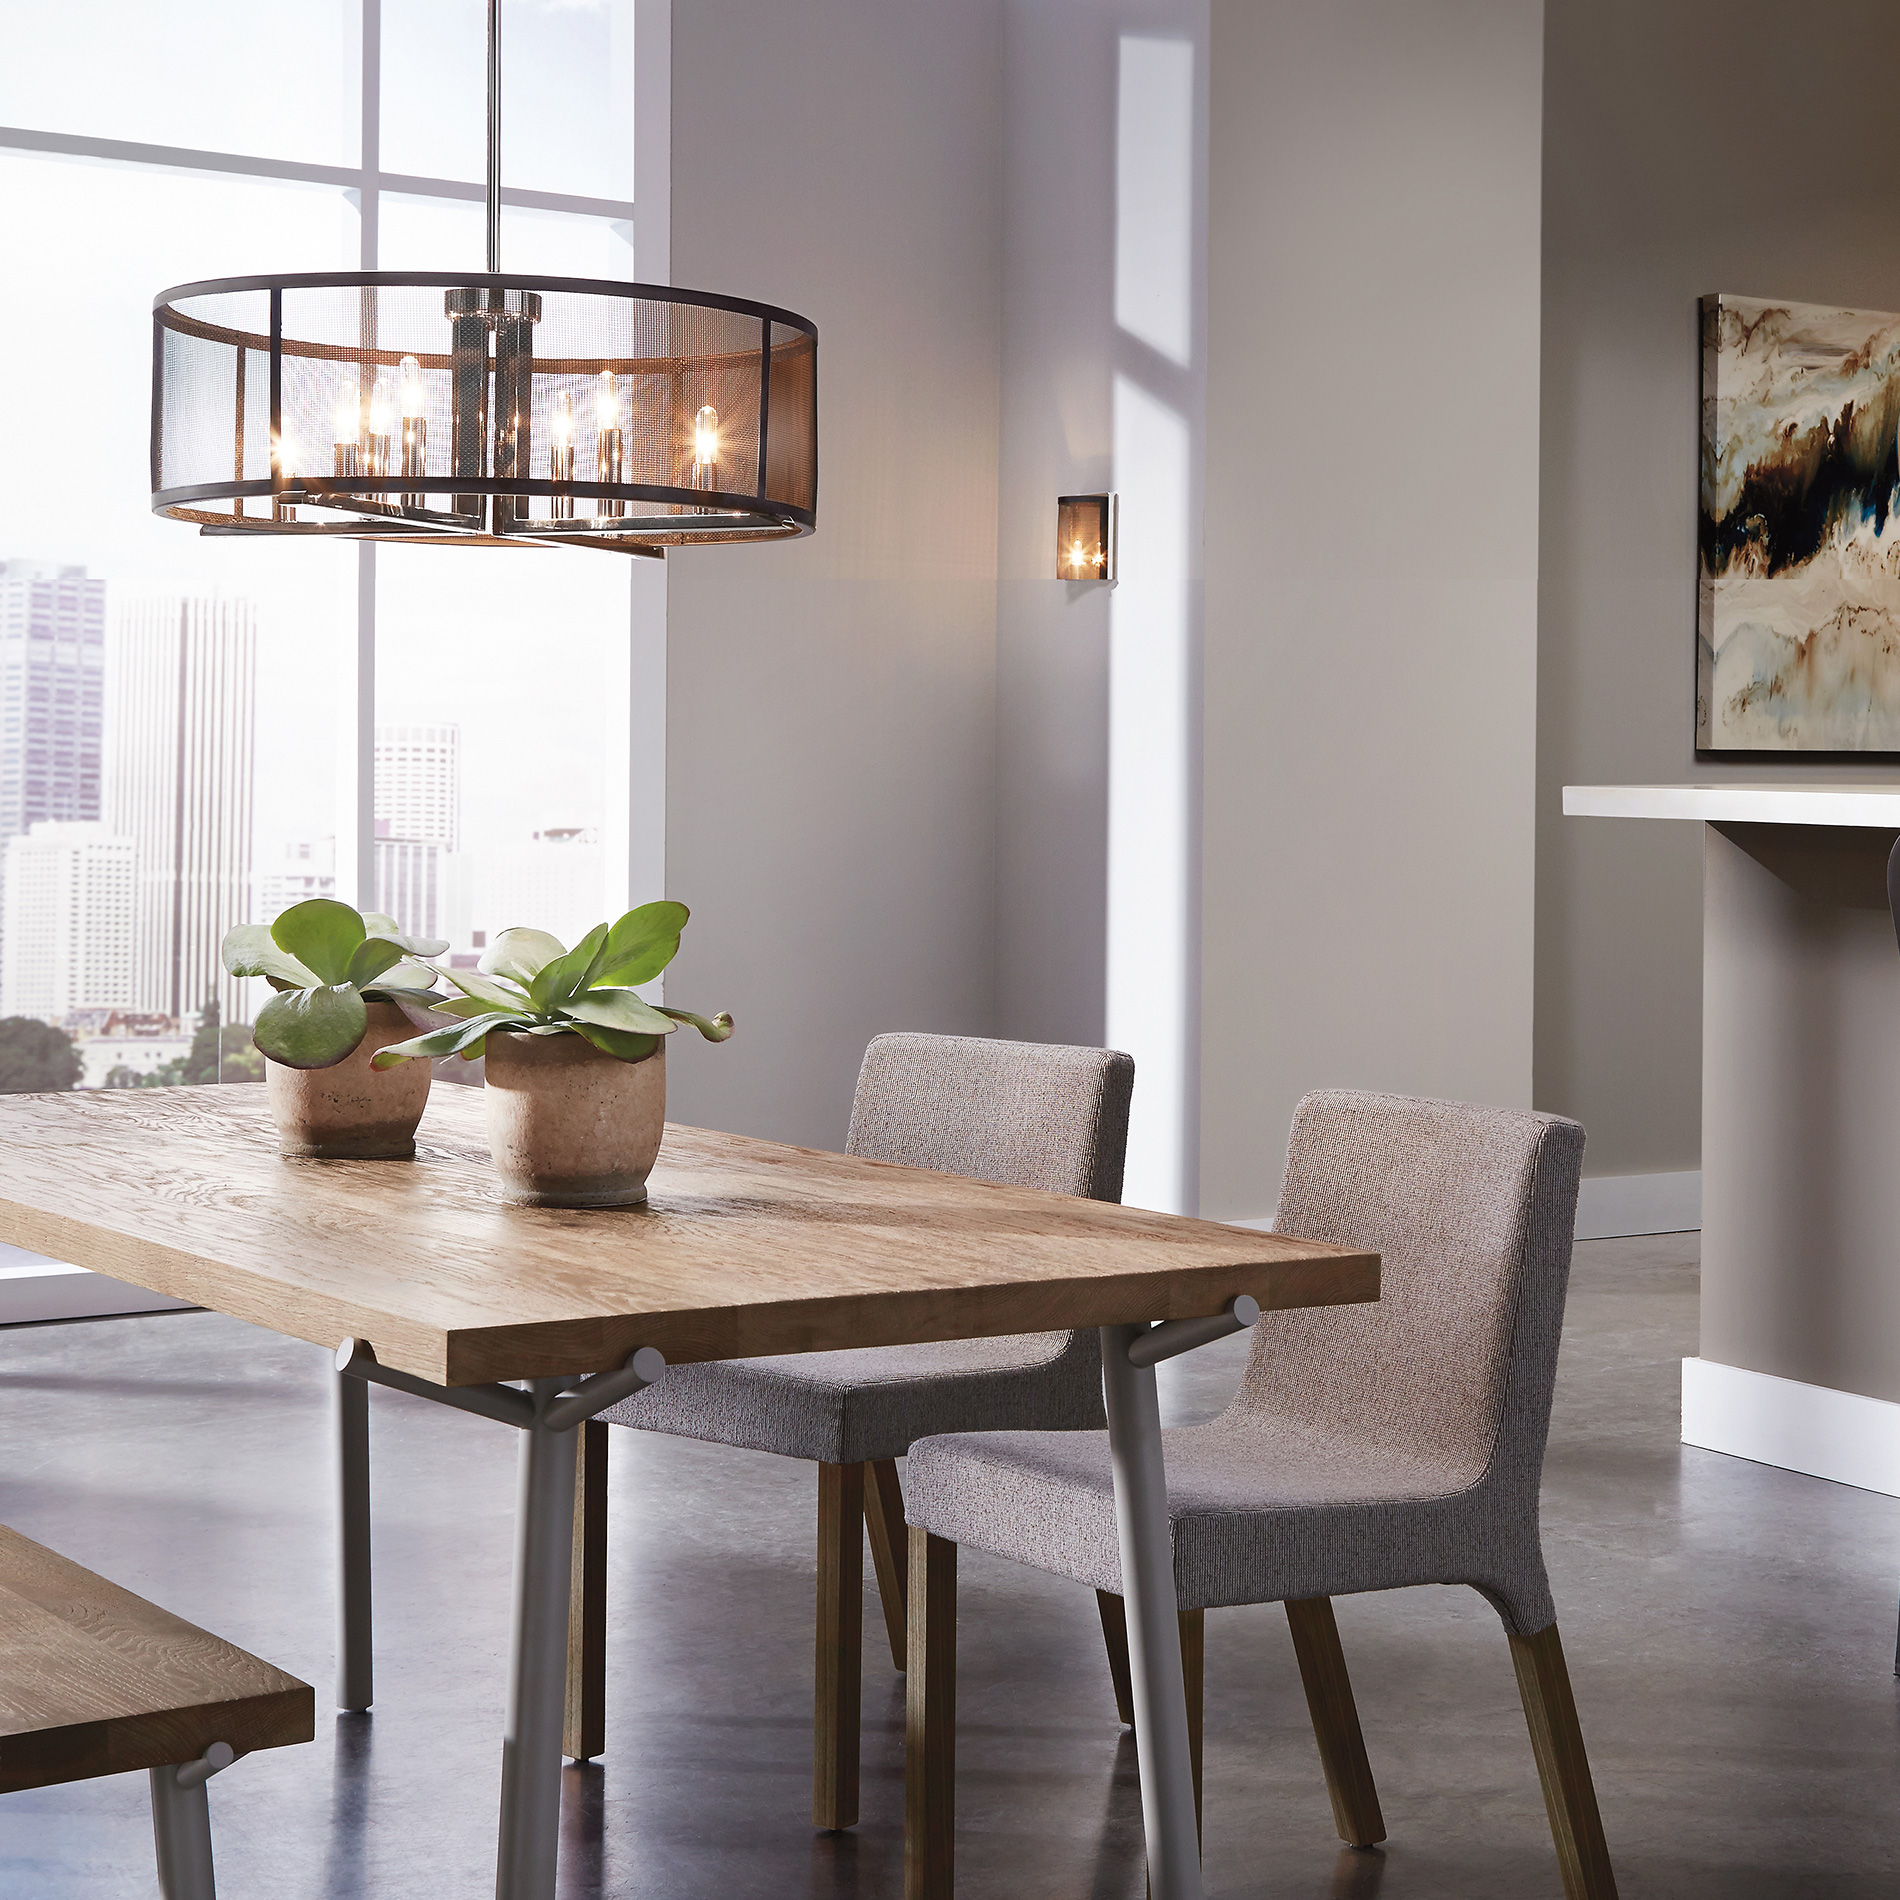 title | Dining room lighting ideas